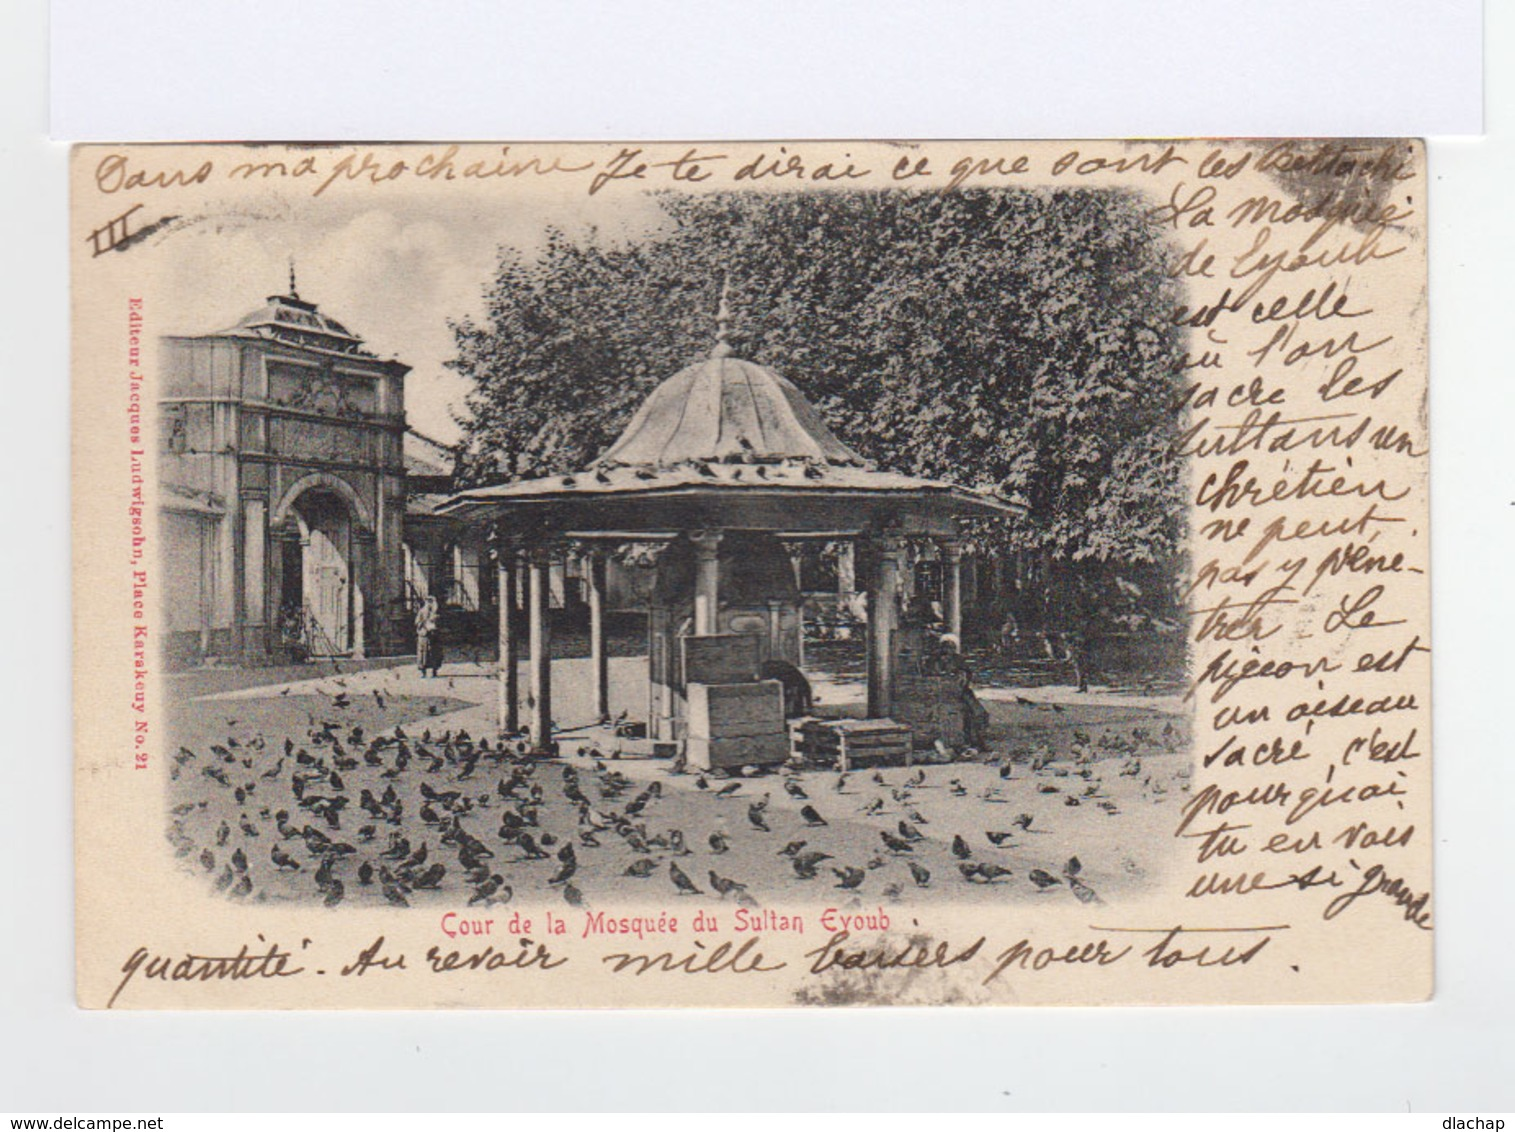 Sur Carte Postale De Turquie Vers Valence Type Sage 10 C. Noir S. Lilas. CAD Constantinople 1902. (803) - 1858-1921 Empire Ottoman